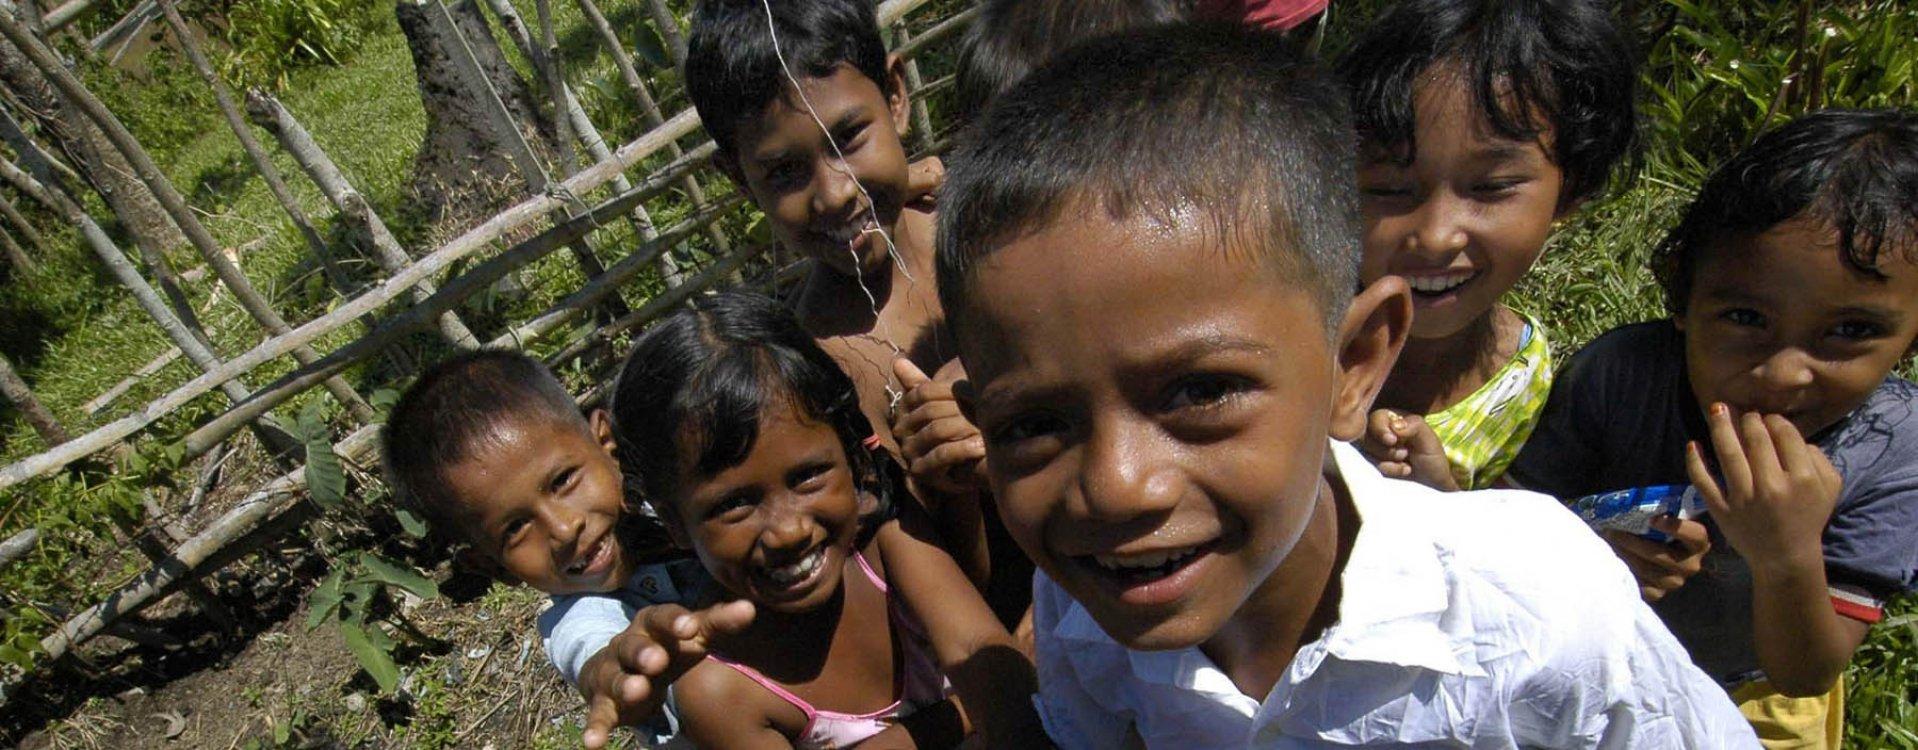 Kinderen in Jogjakarta